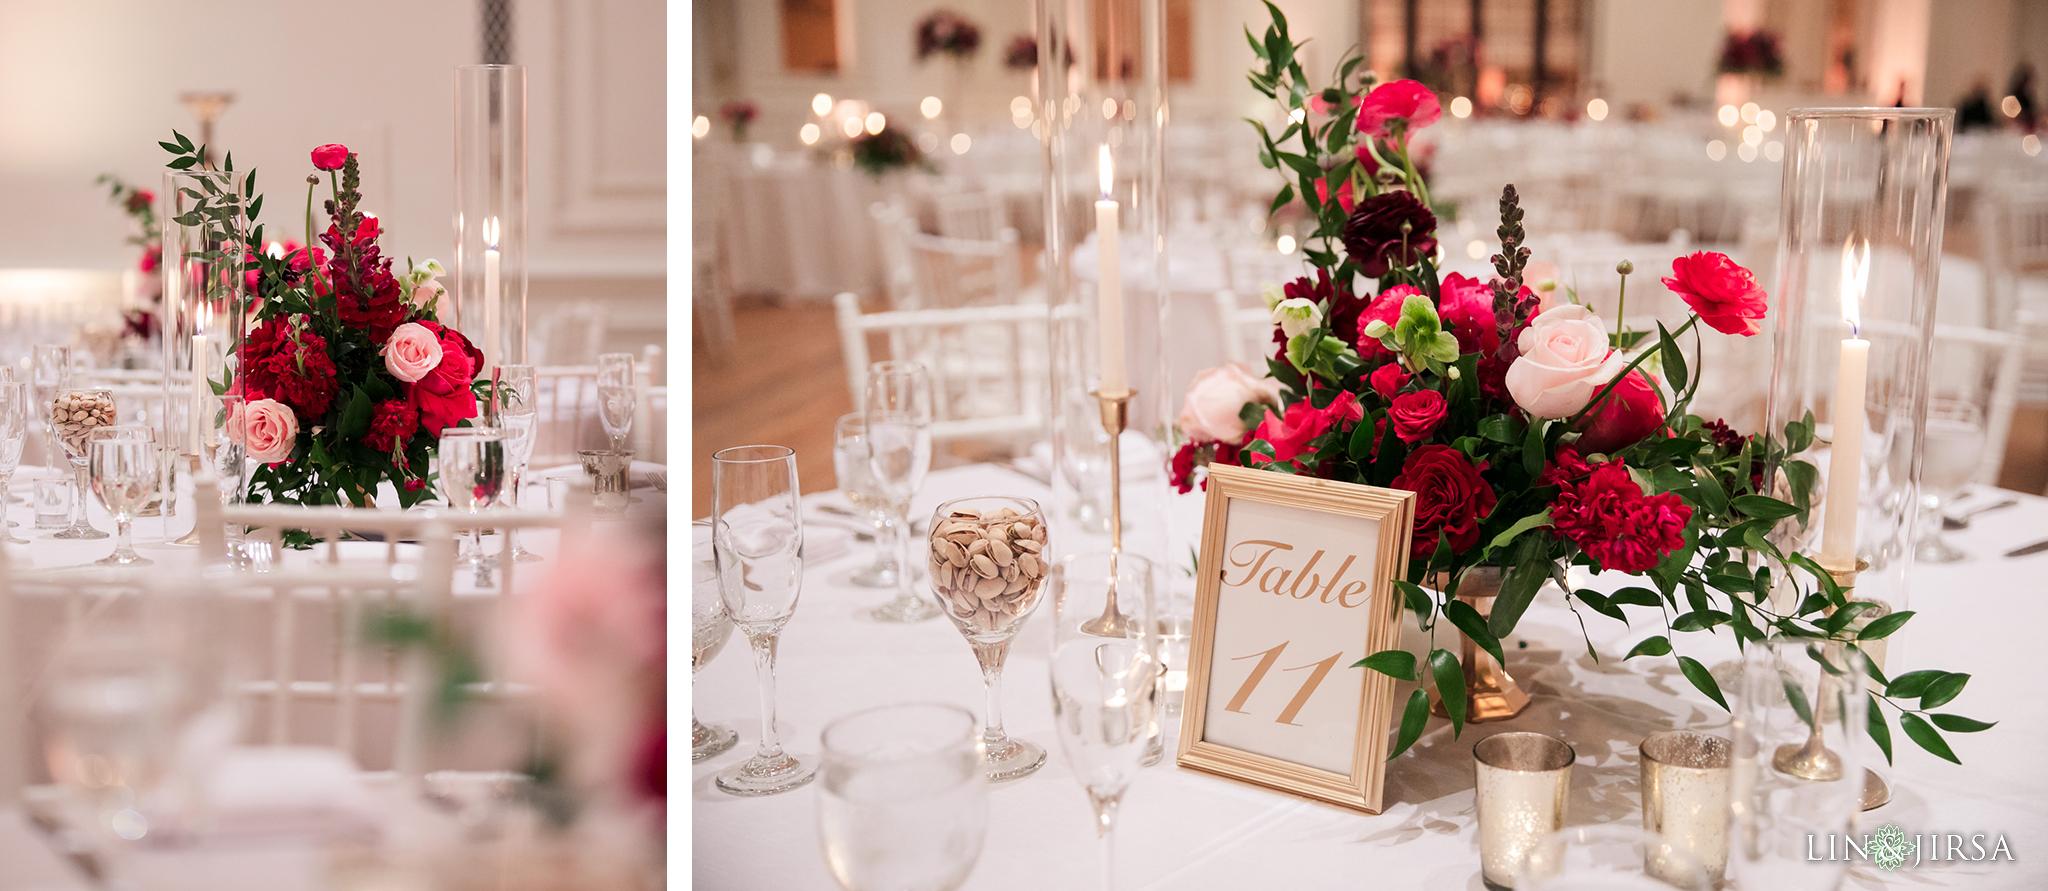 24 Alexandria Ballrooms Los Angeles Jewish Wedding Photography